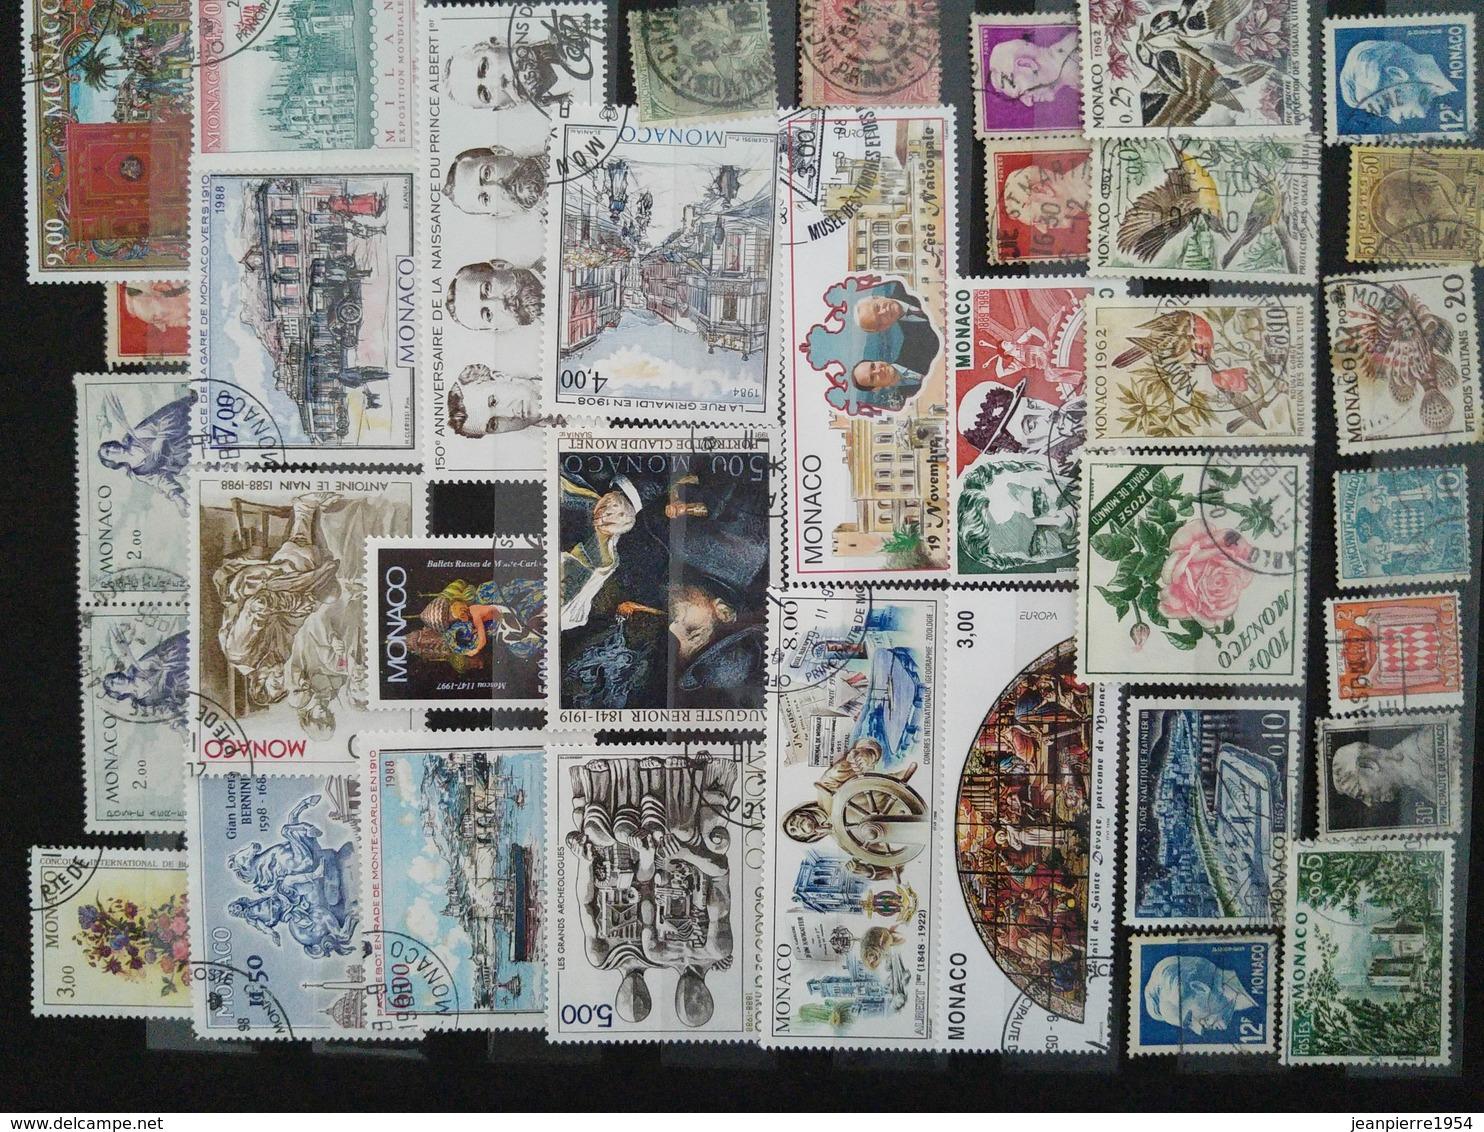 Album Monaco Oblitere Grosse Cote - Collections (with Albums)